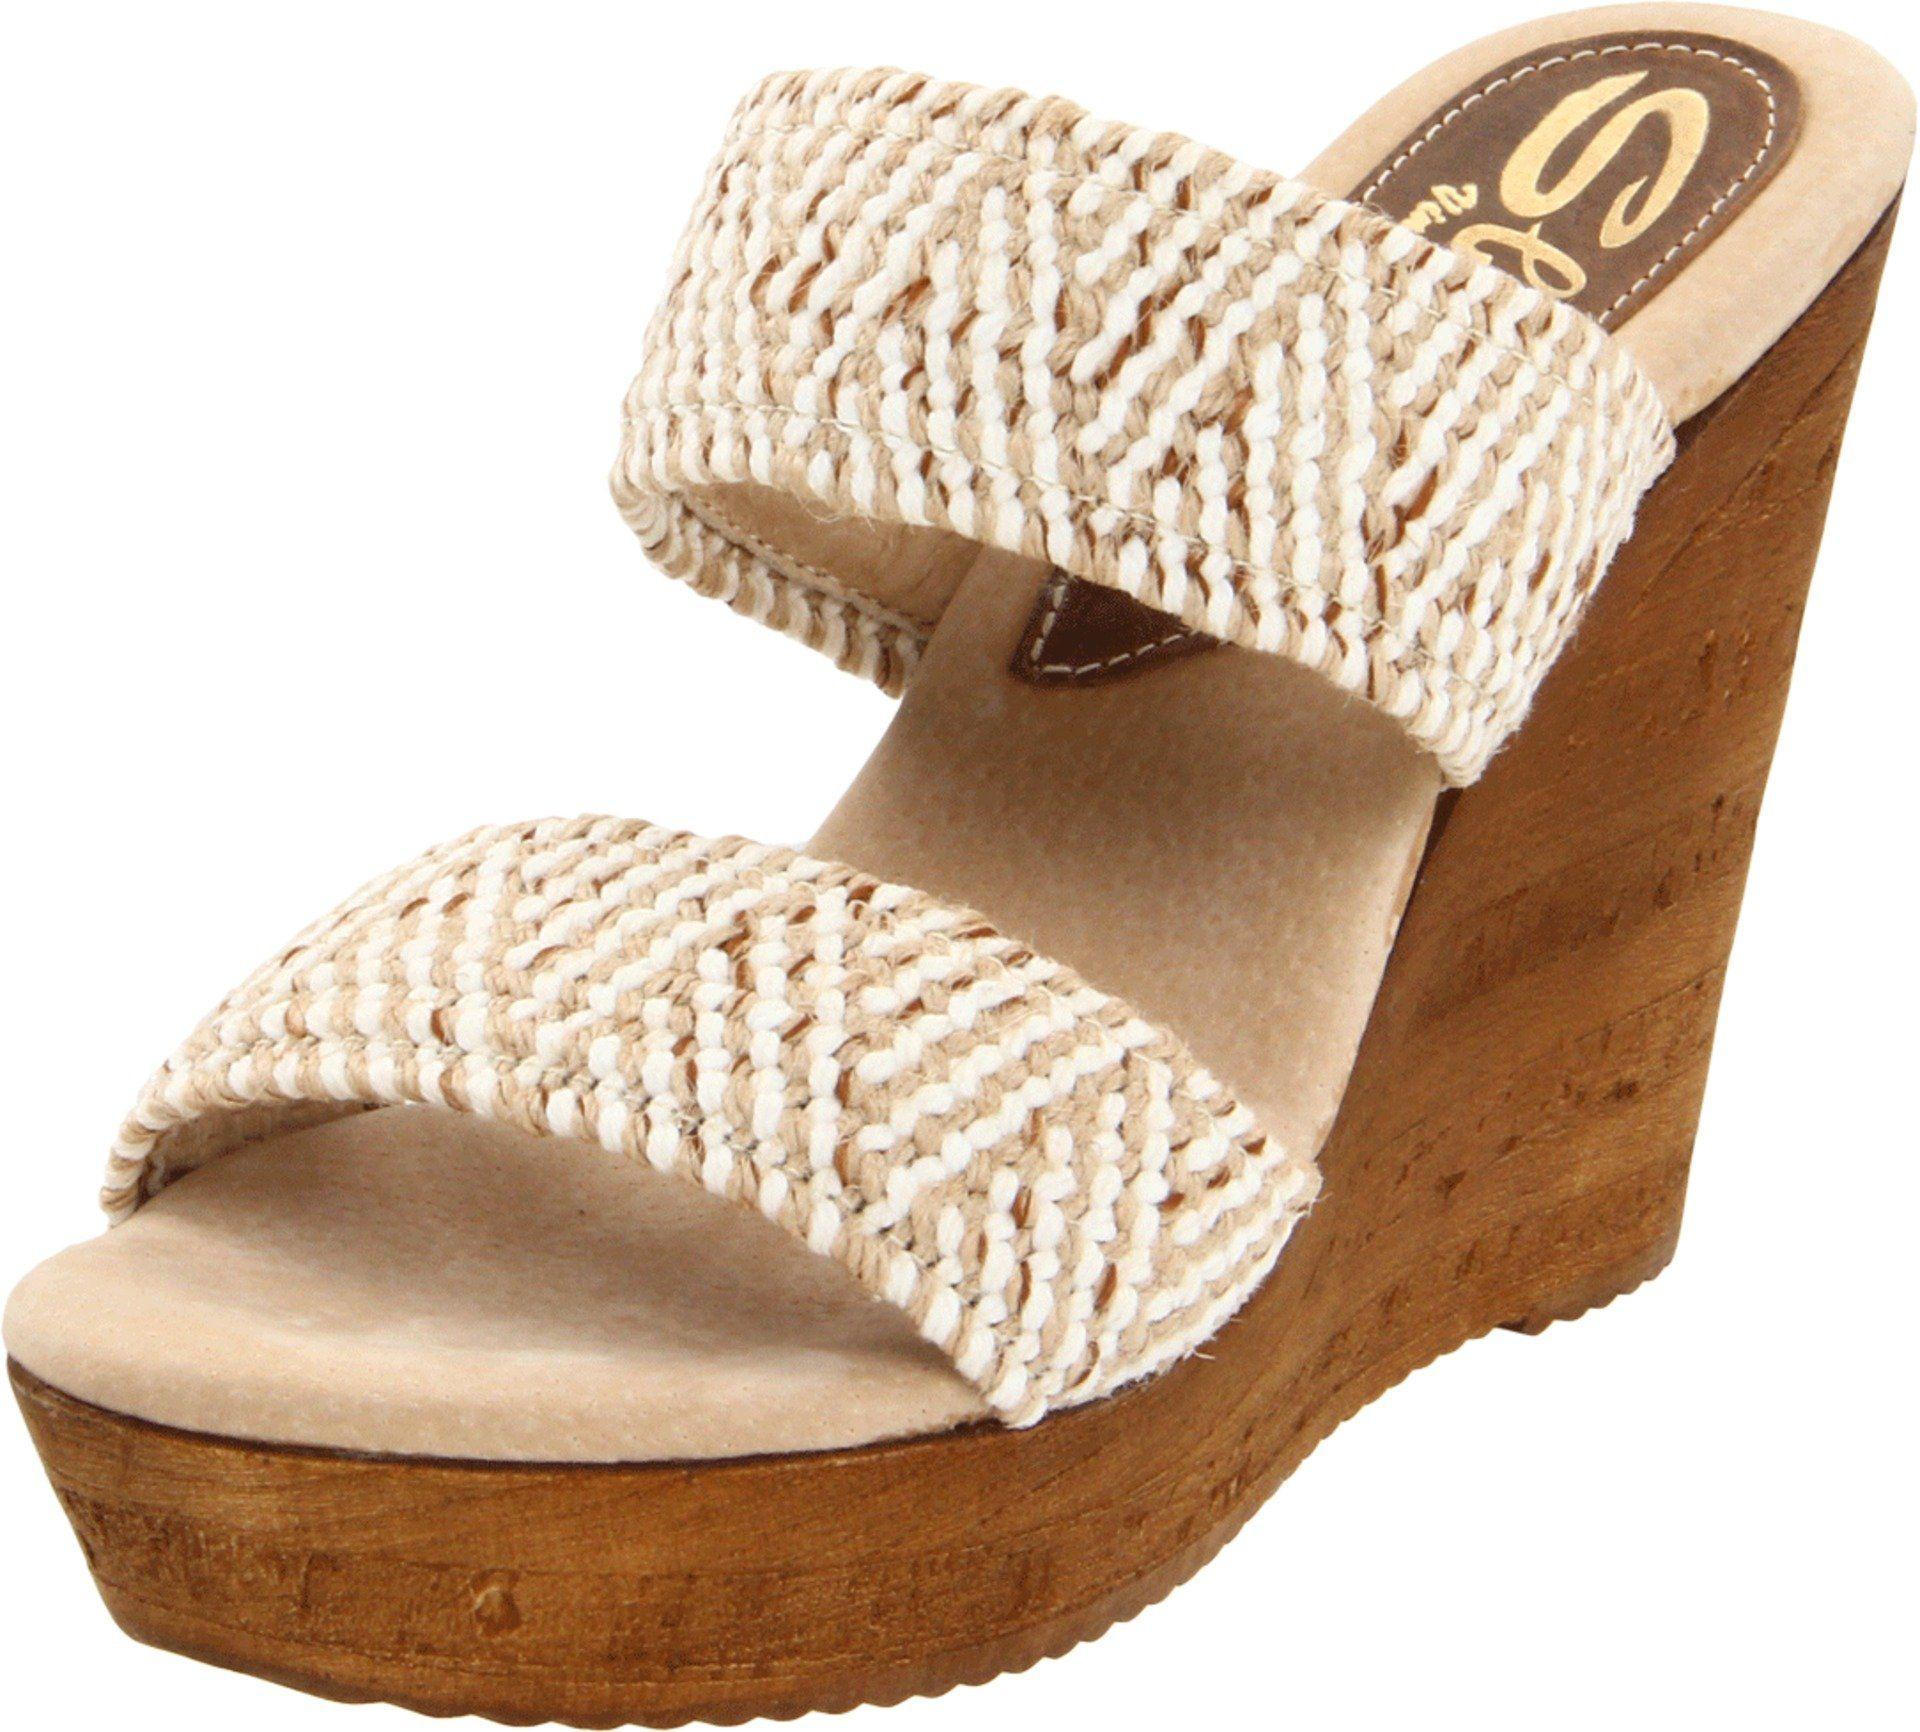 6f4f14e5cca6 Amazon.com  Sbicca Women s Tristan Wedge Sandal  Shoes